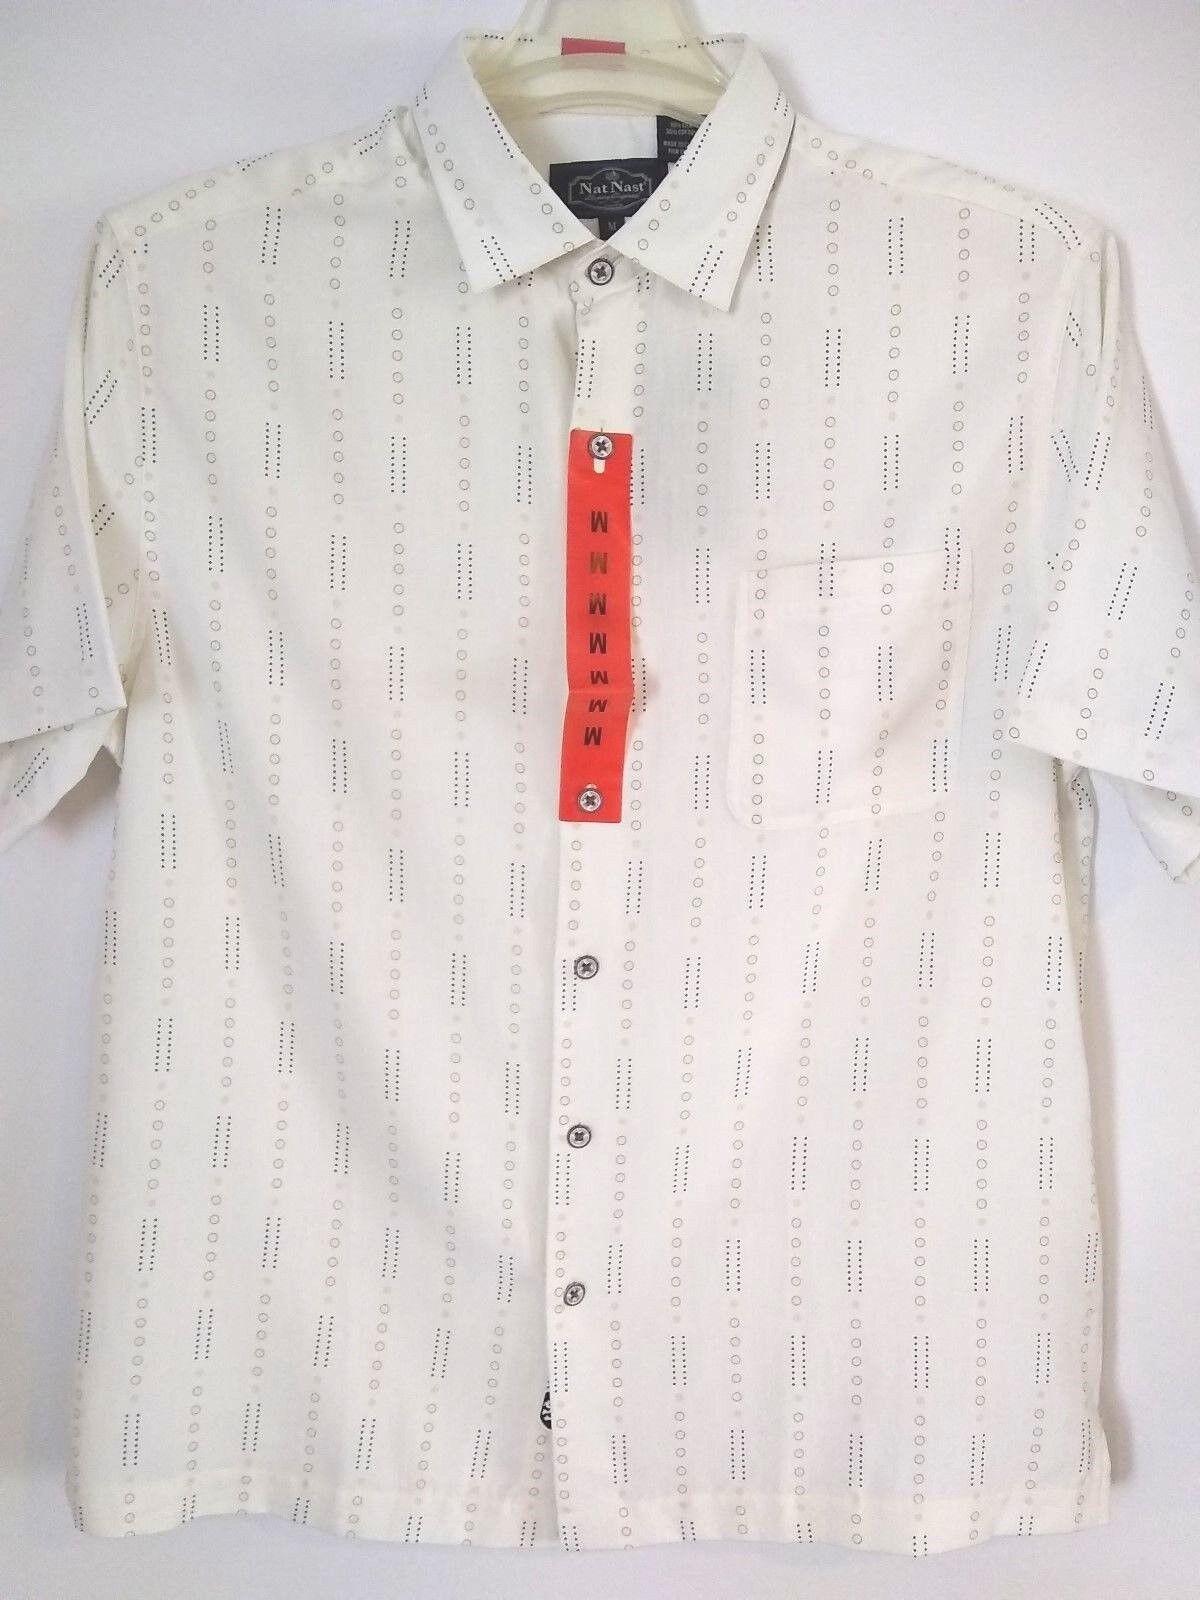 Nat Nast Mens Retro Print Short Sleeve Button Up Shirt NWT Size Medium